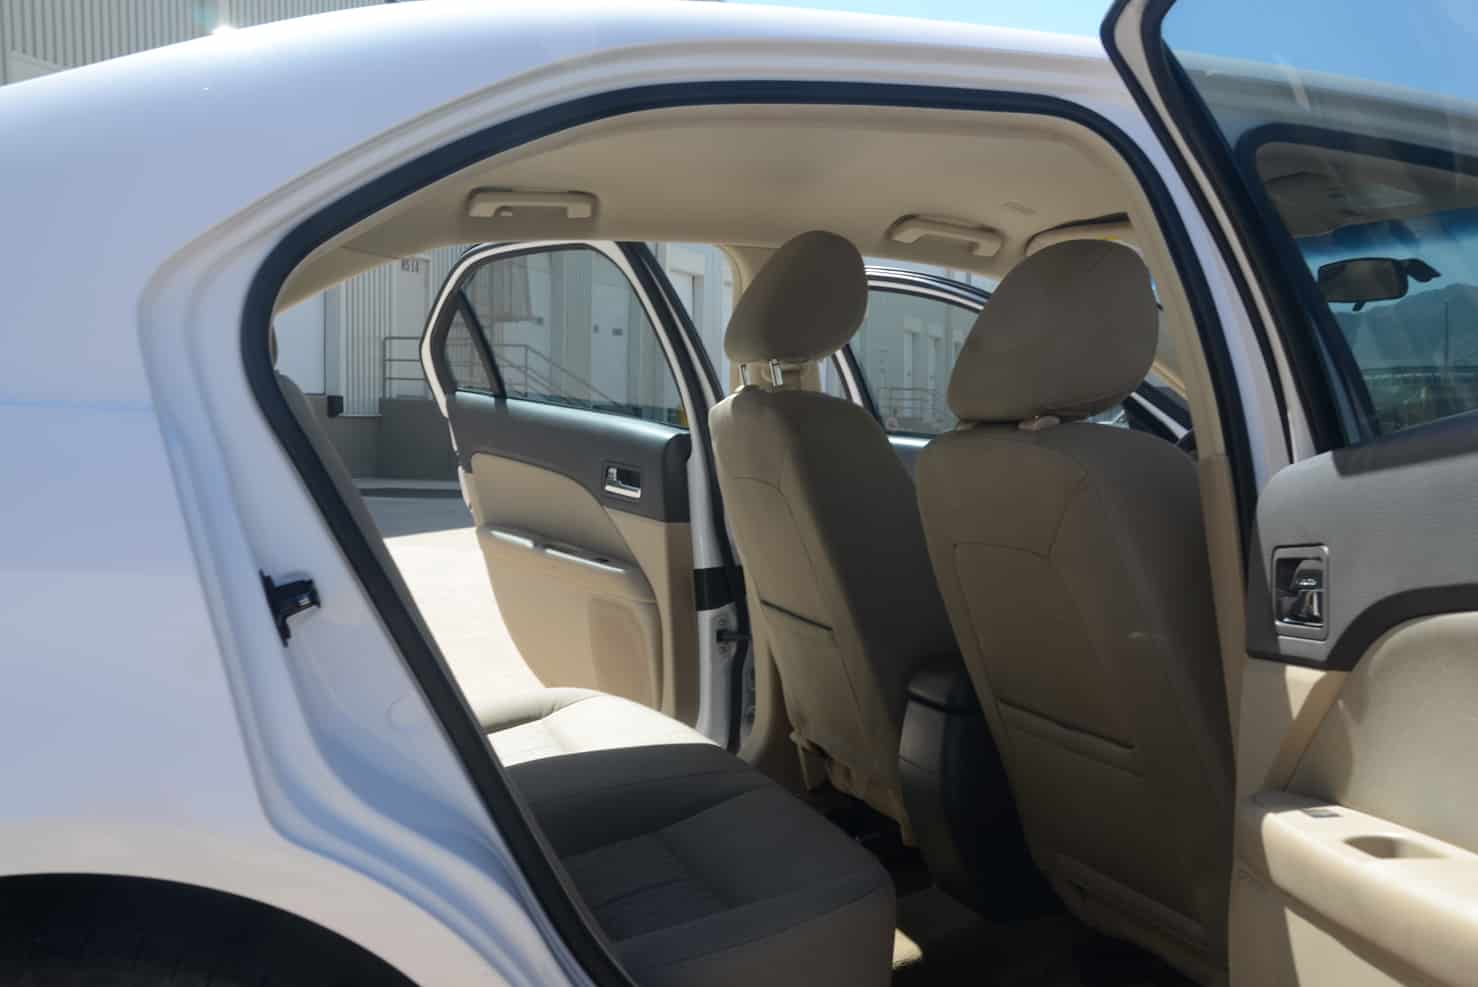 Ford Fusion Mid-Sized Sedan Interior